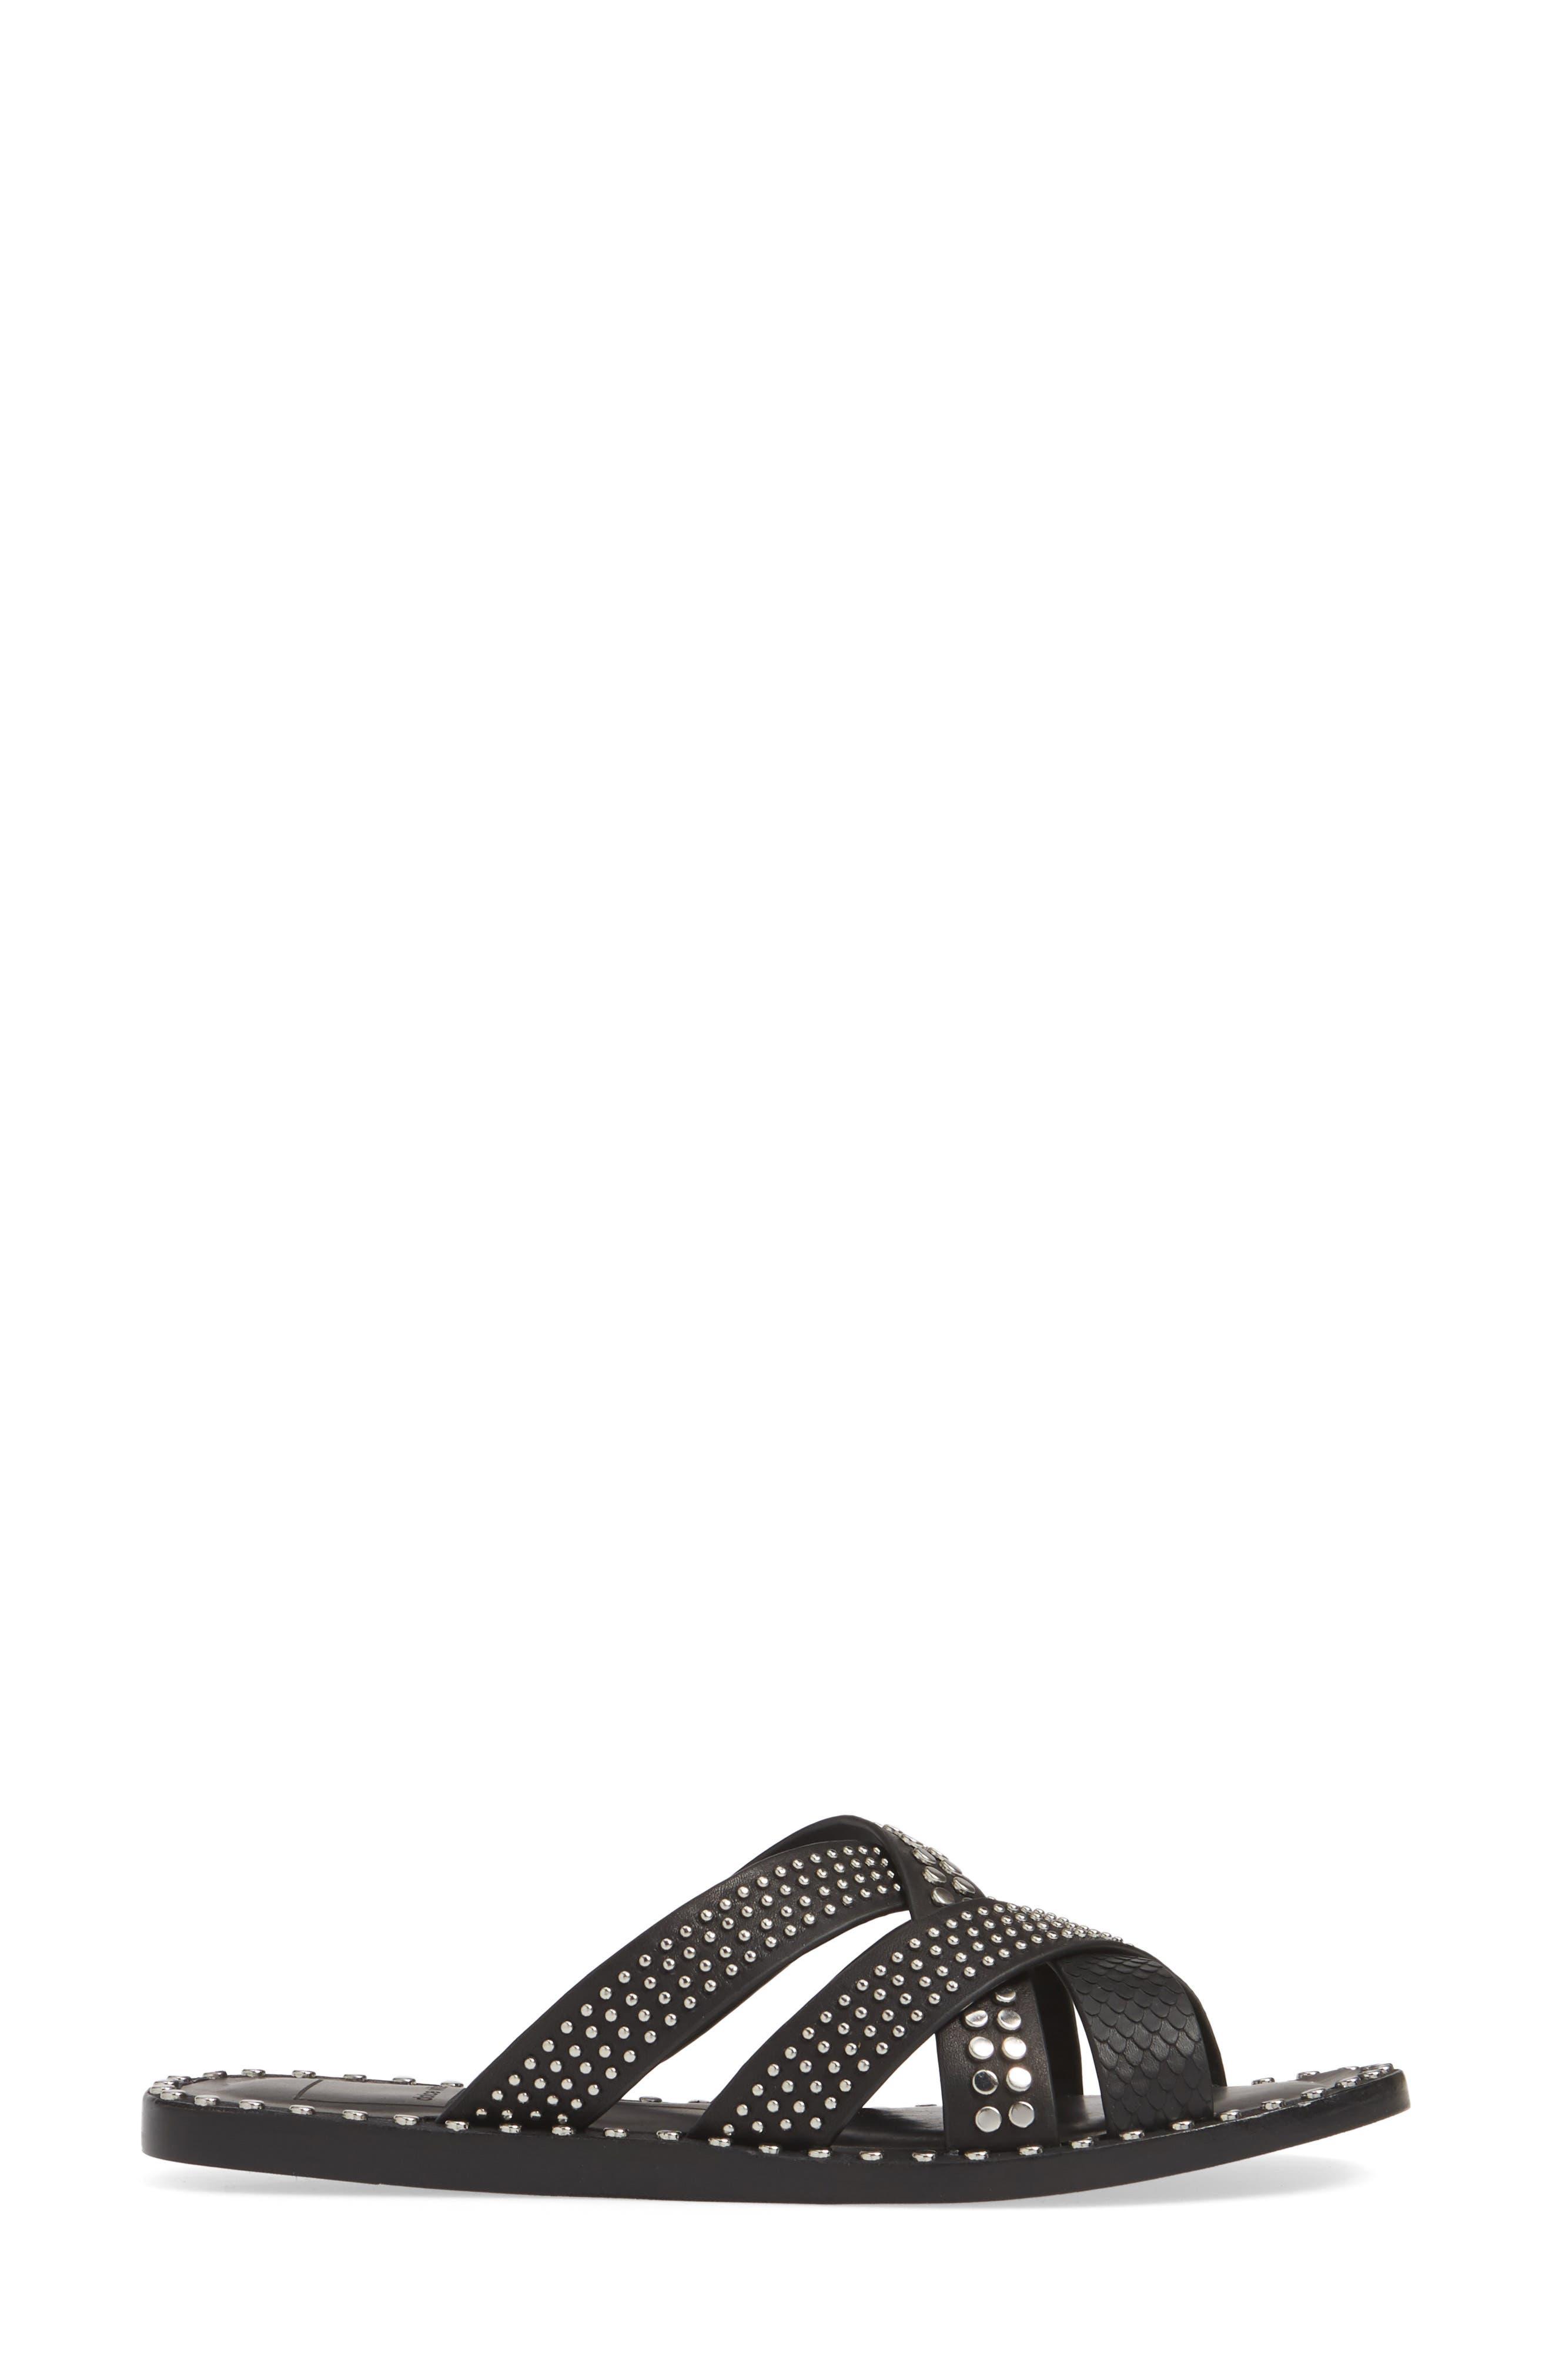 DOLCE VITA, Corbey Studded Slide Sandal, Alternate thumbnail 3, color, BLACK LEATHER